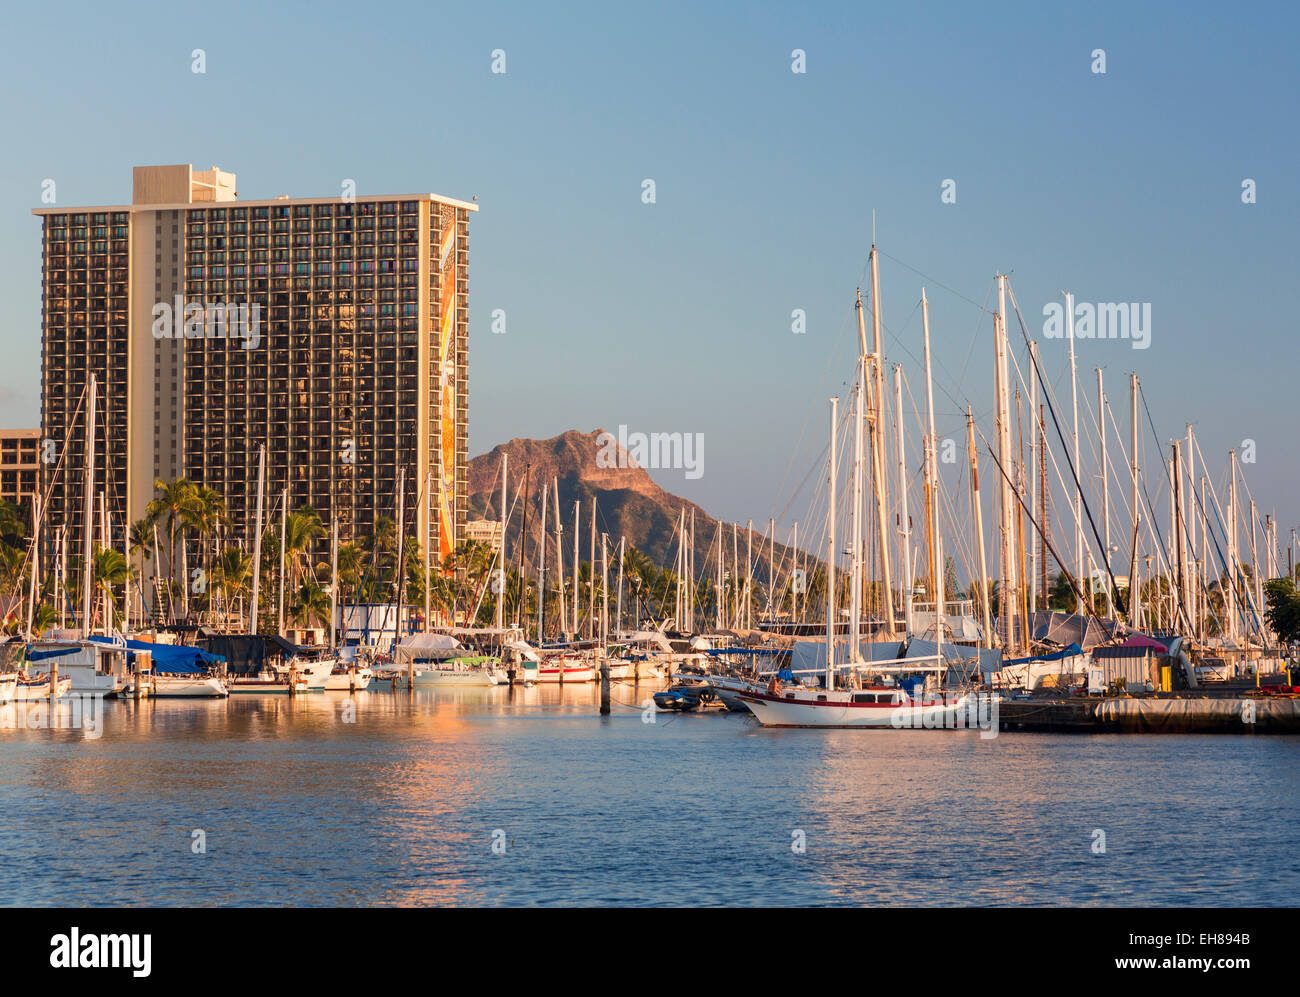 Waikiki, Hawaii, with sailboats in Ala Moana harbour and Hilton Hawaiian Village resort behind Stock Photo